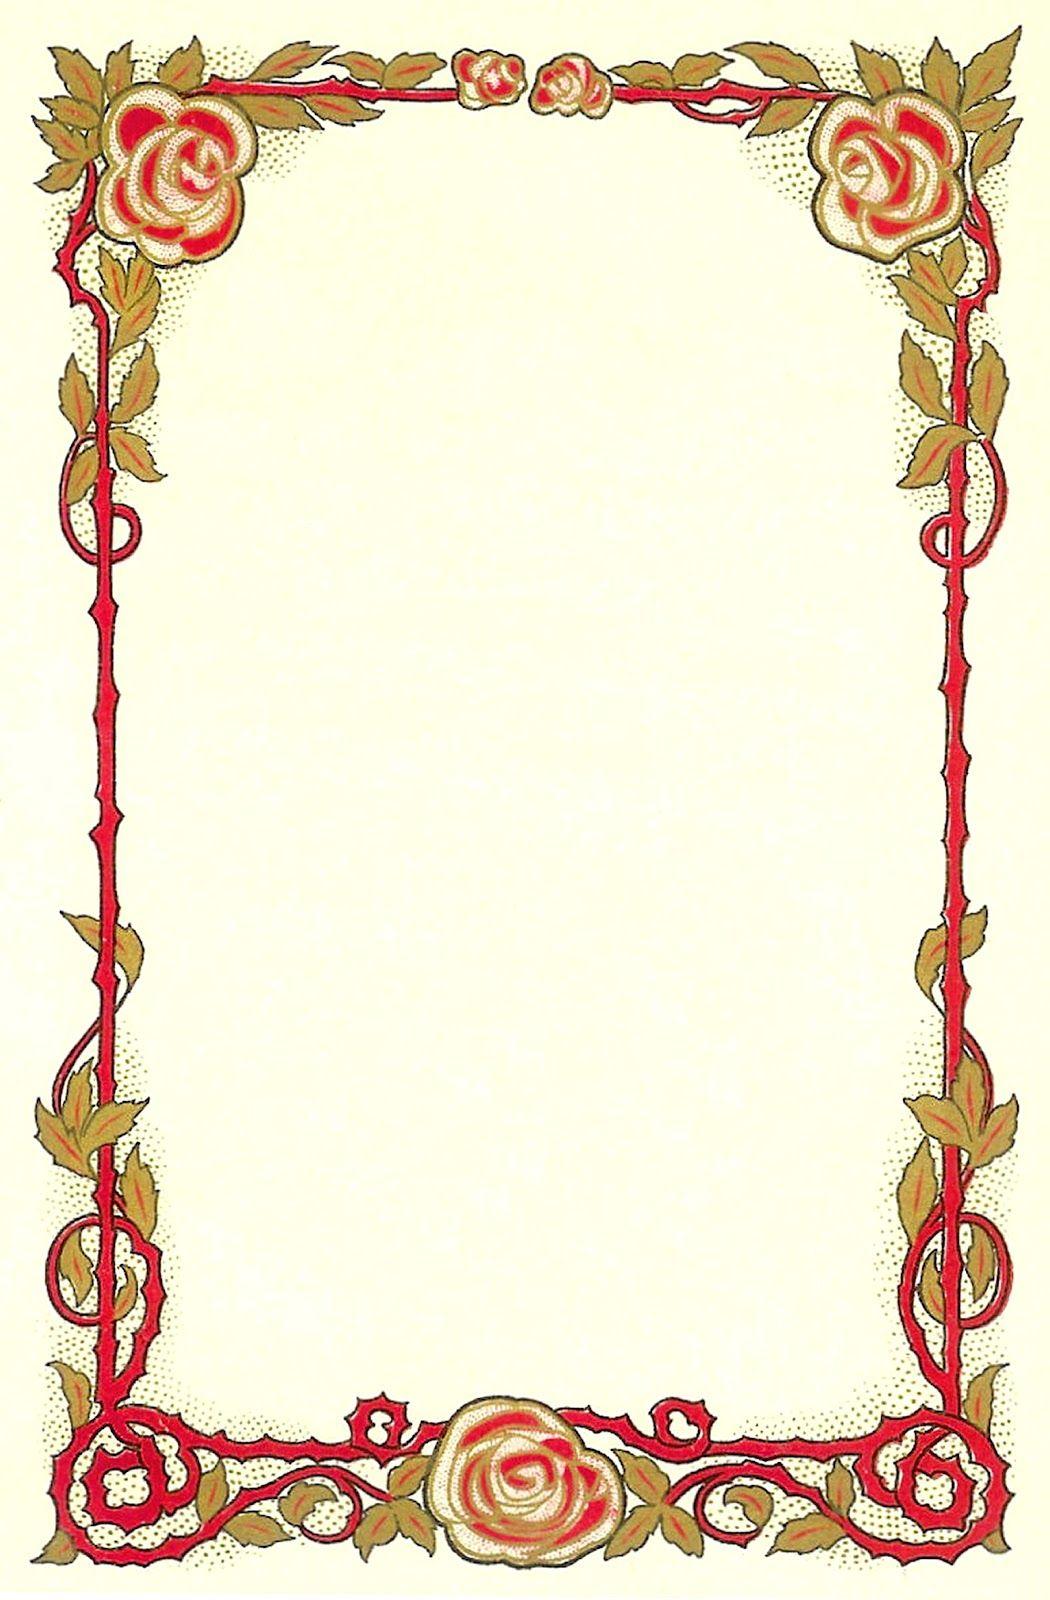 Antique Images: Flower Clip Art: Vintage Graphic of Red Rose.